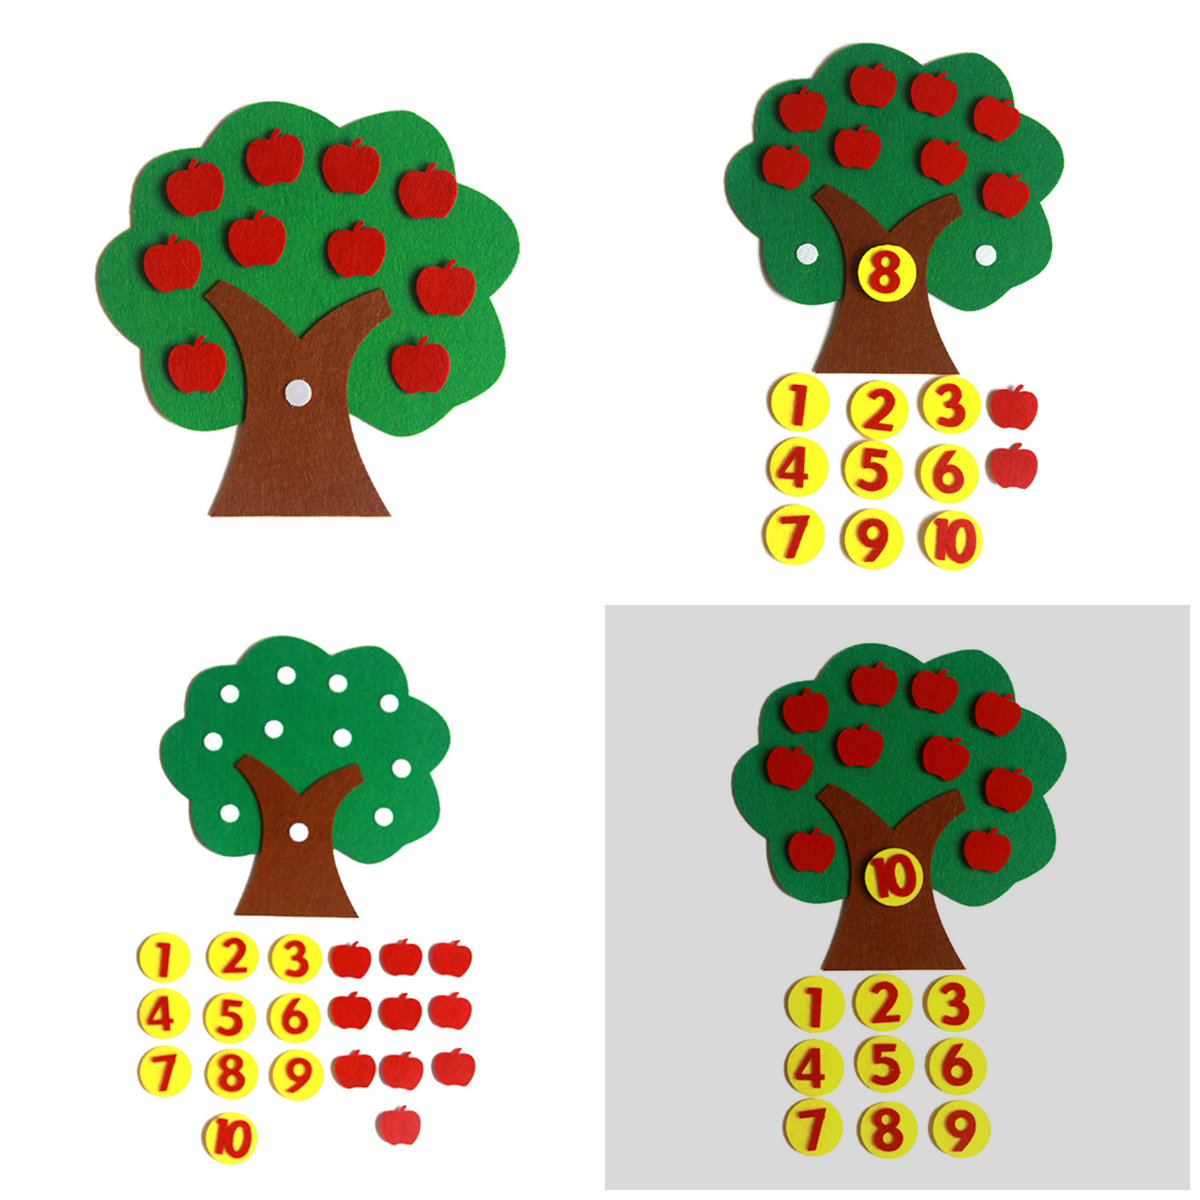 87 Gambar Apel Matematika